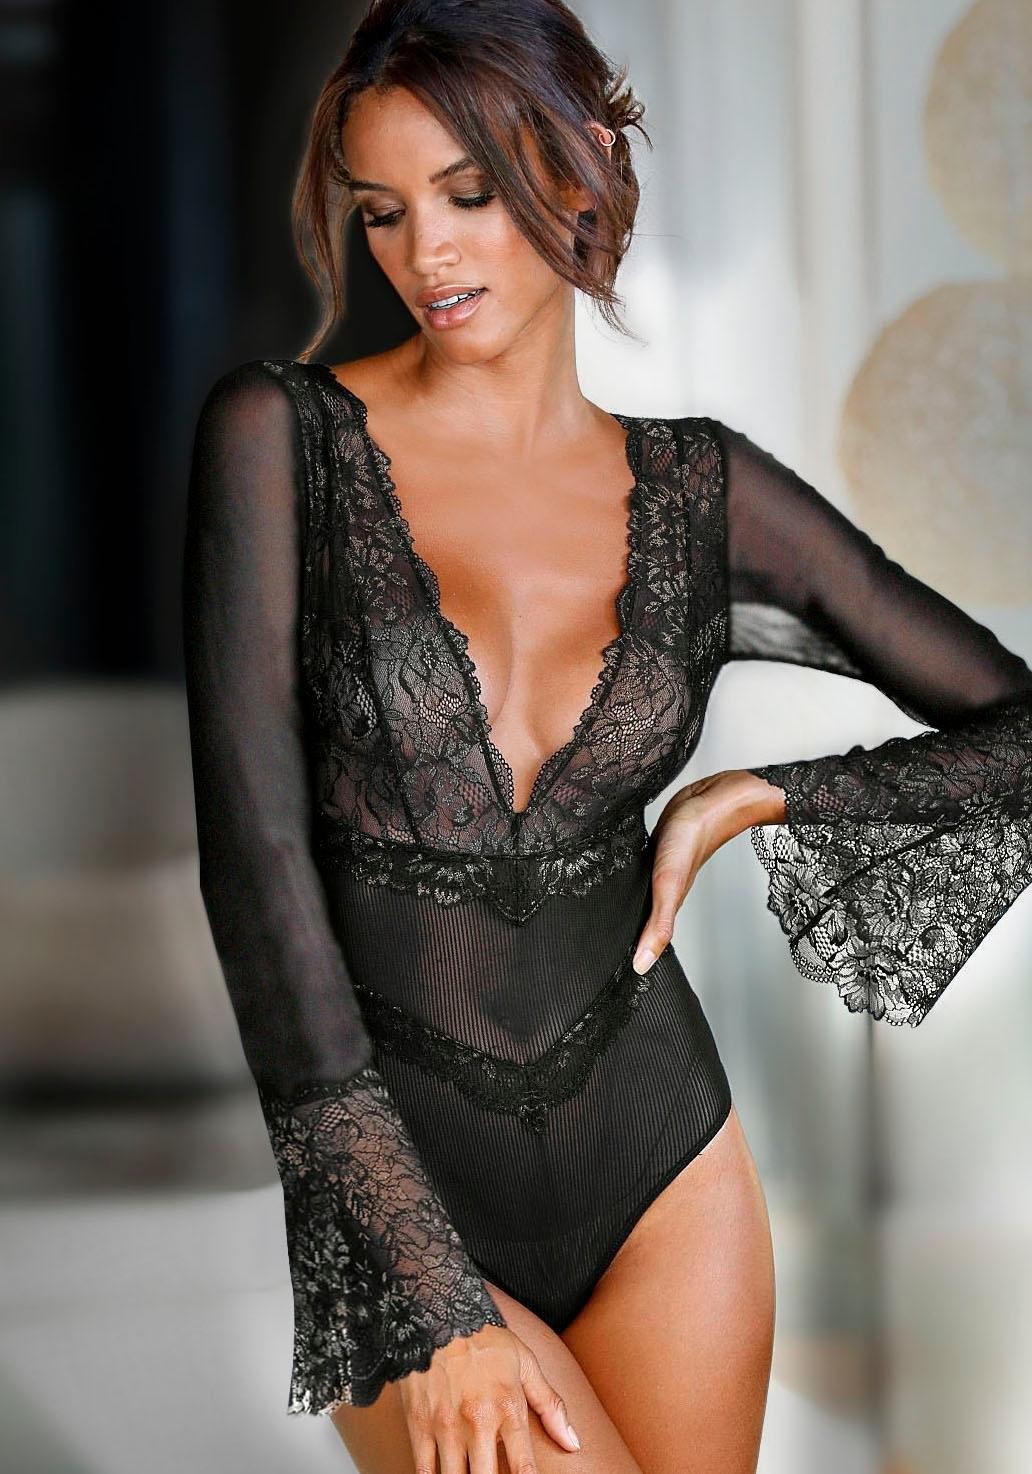 LASCANA body nu online kopen bij Lascana